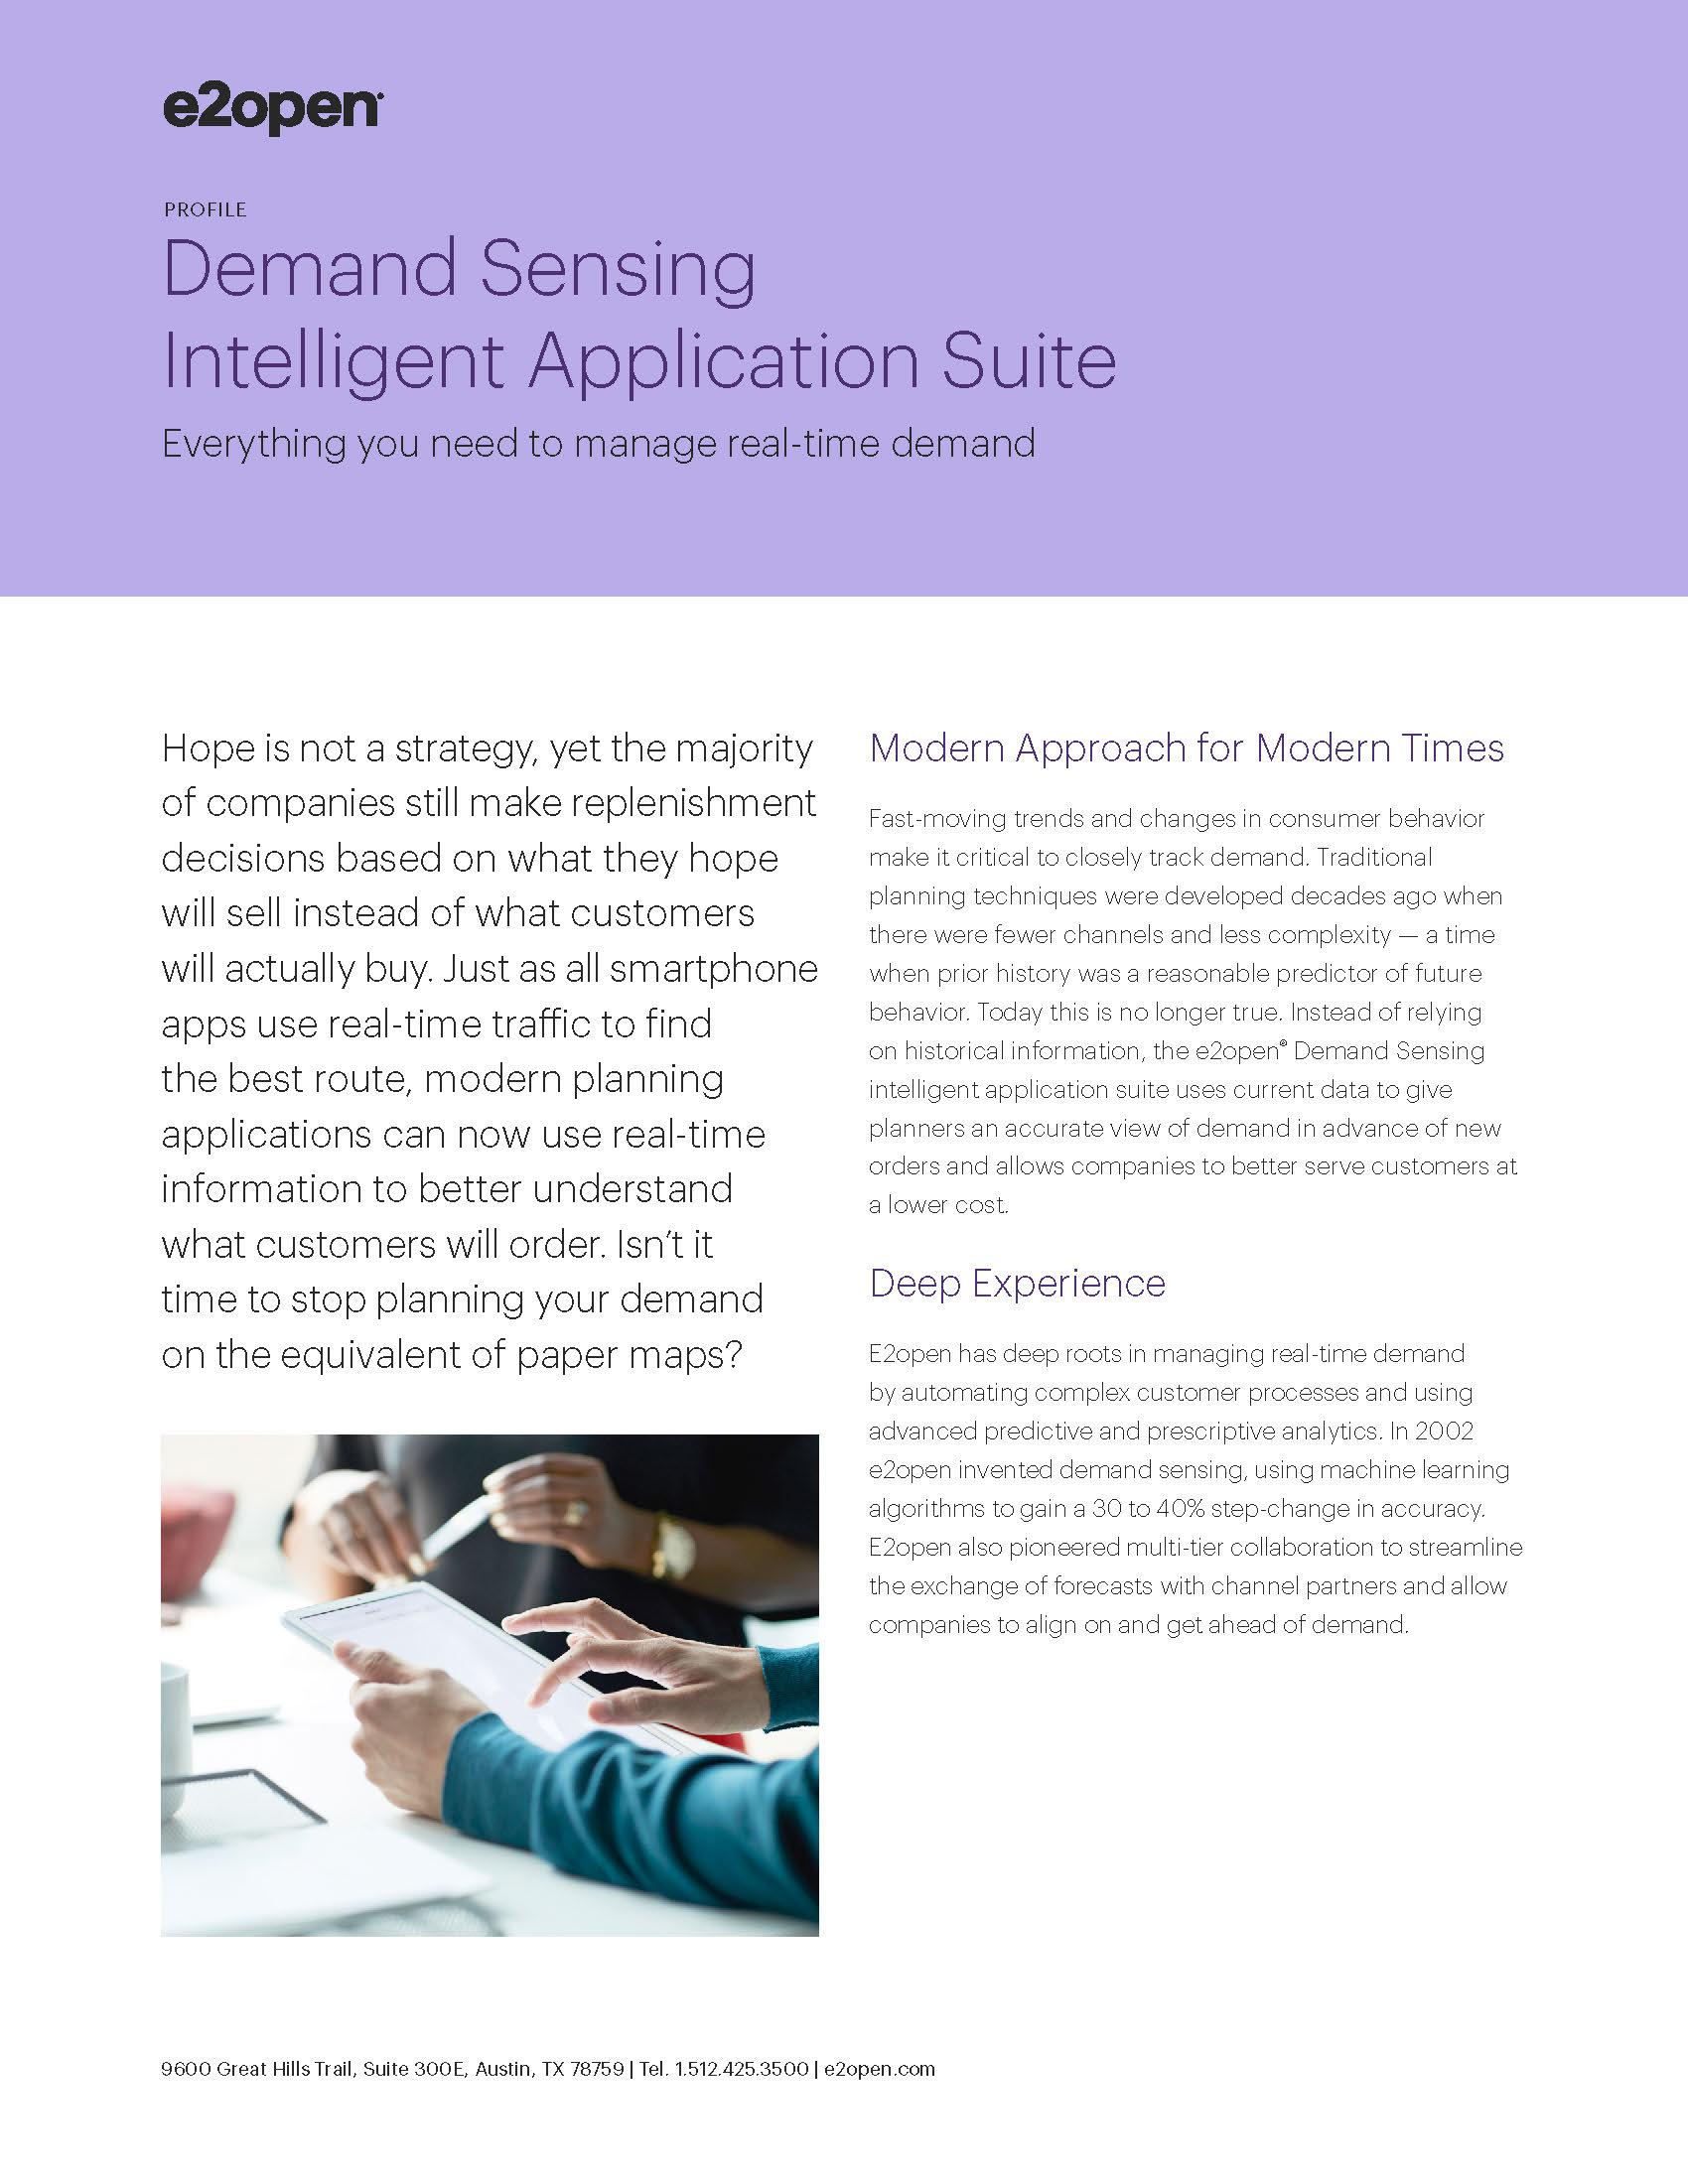 Demand Sensing Intelligent Application Suite Profile